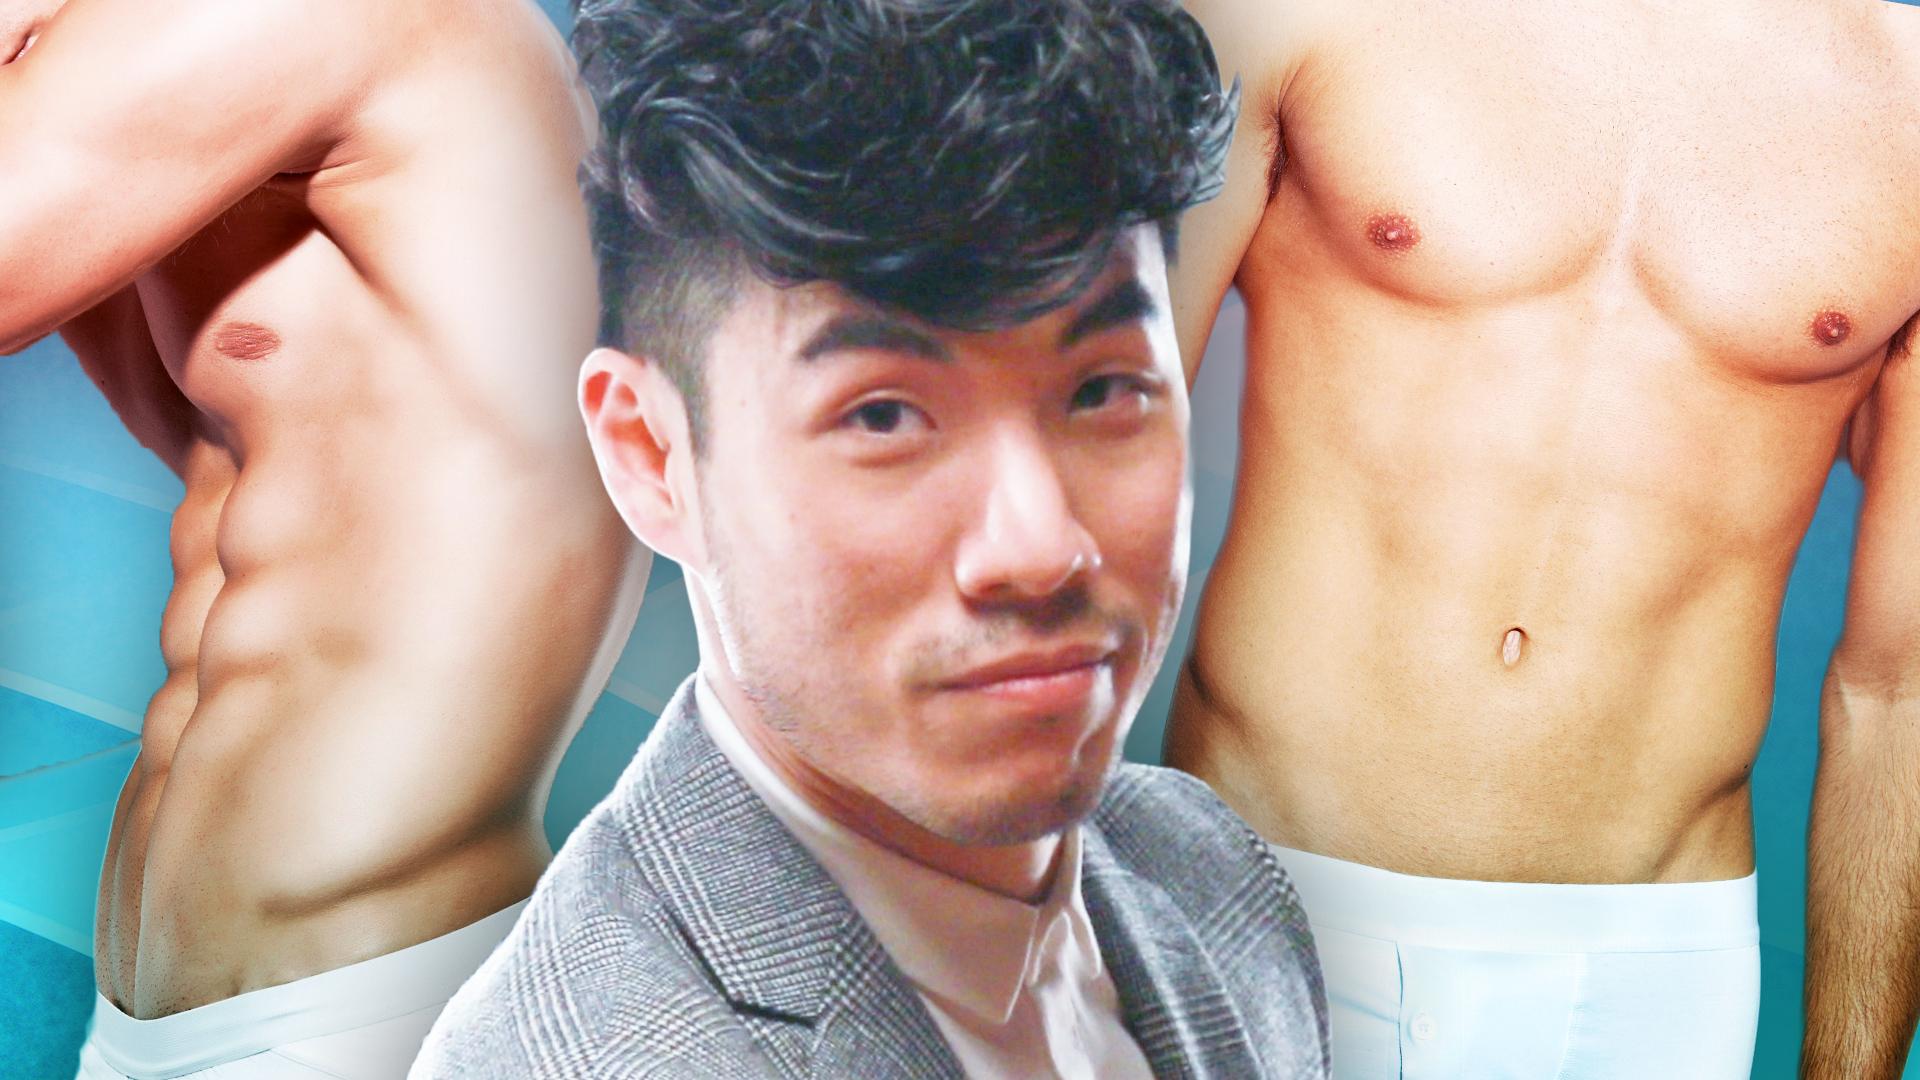 China Dating App Helps Gay Men Banish The Blues